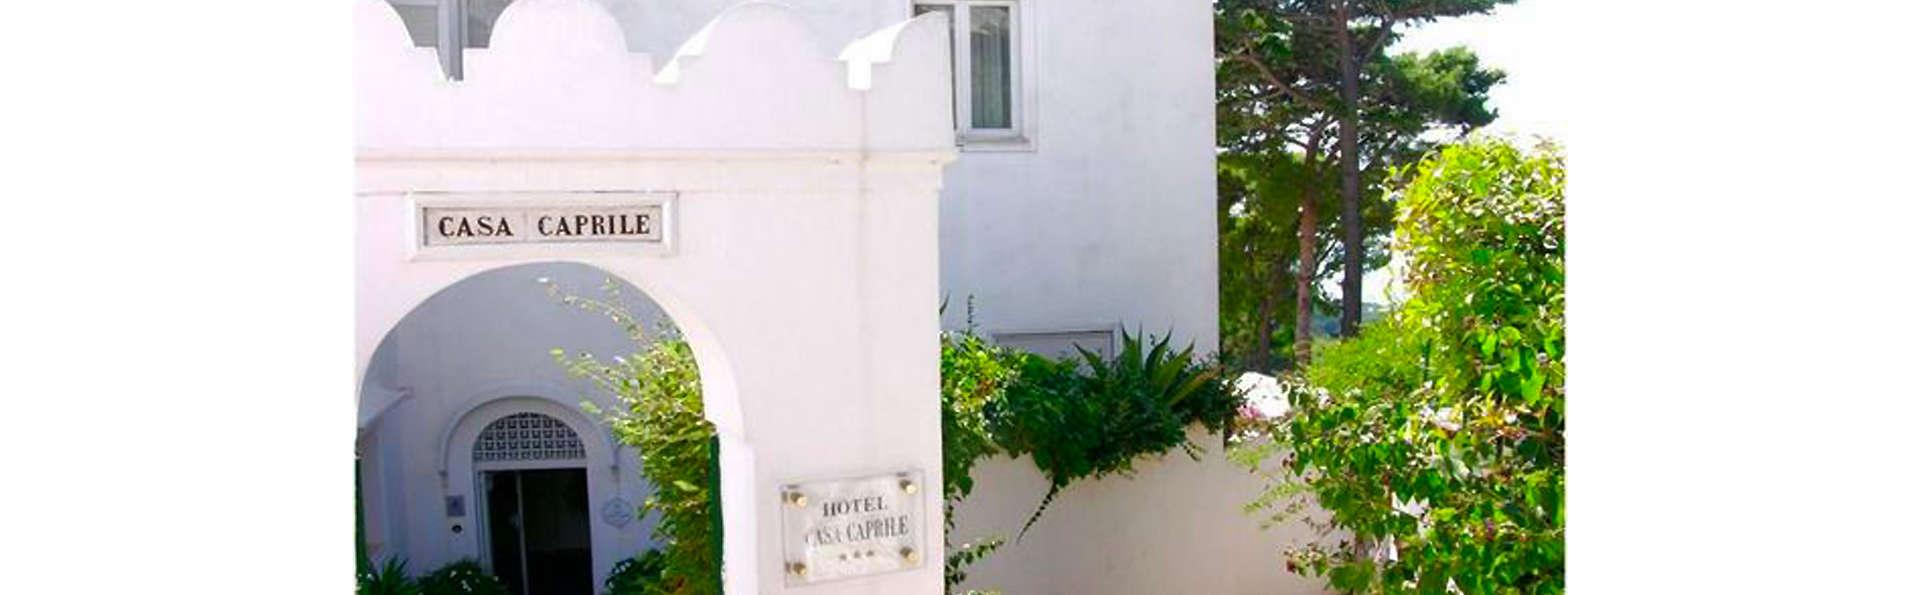 Hotel Casa Caprile - EDIT_FRONT_01.jpg